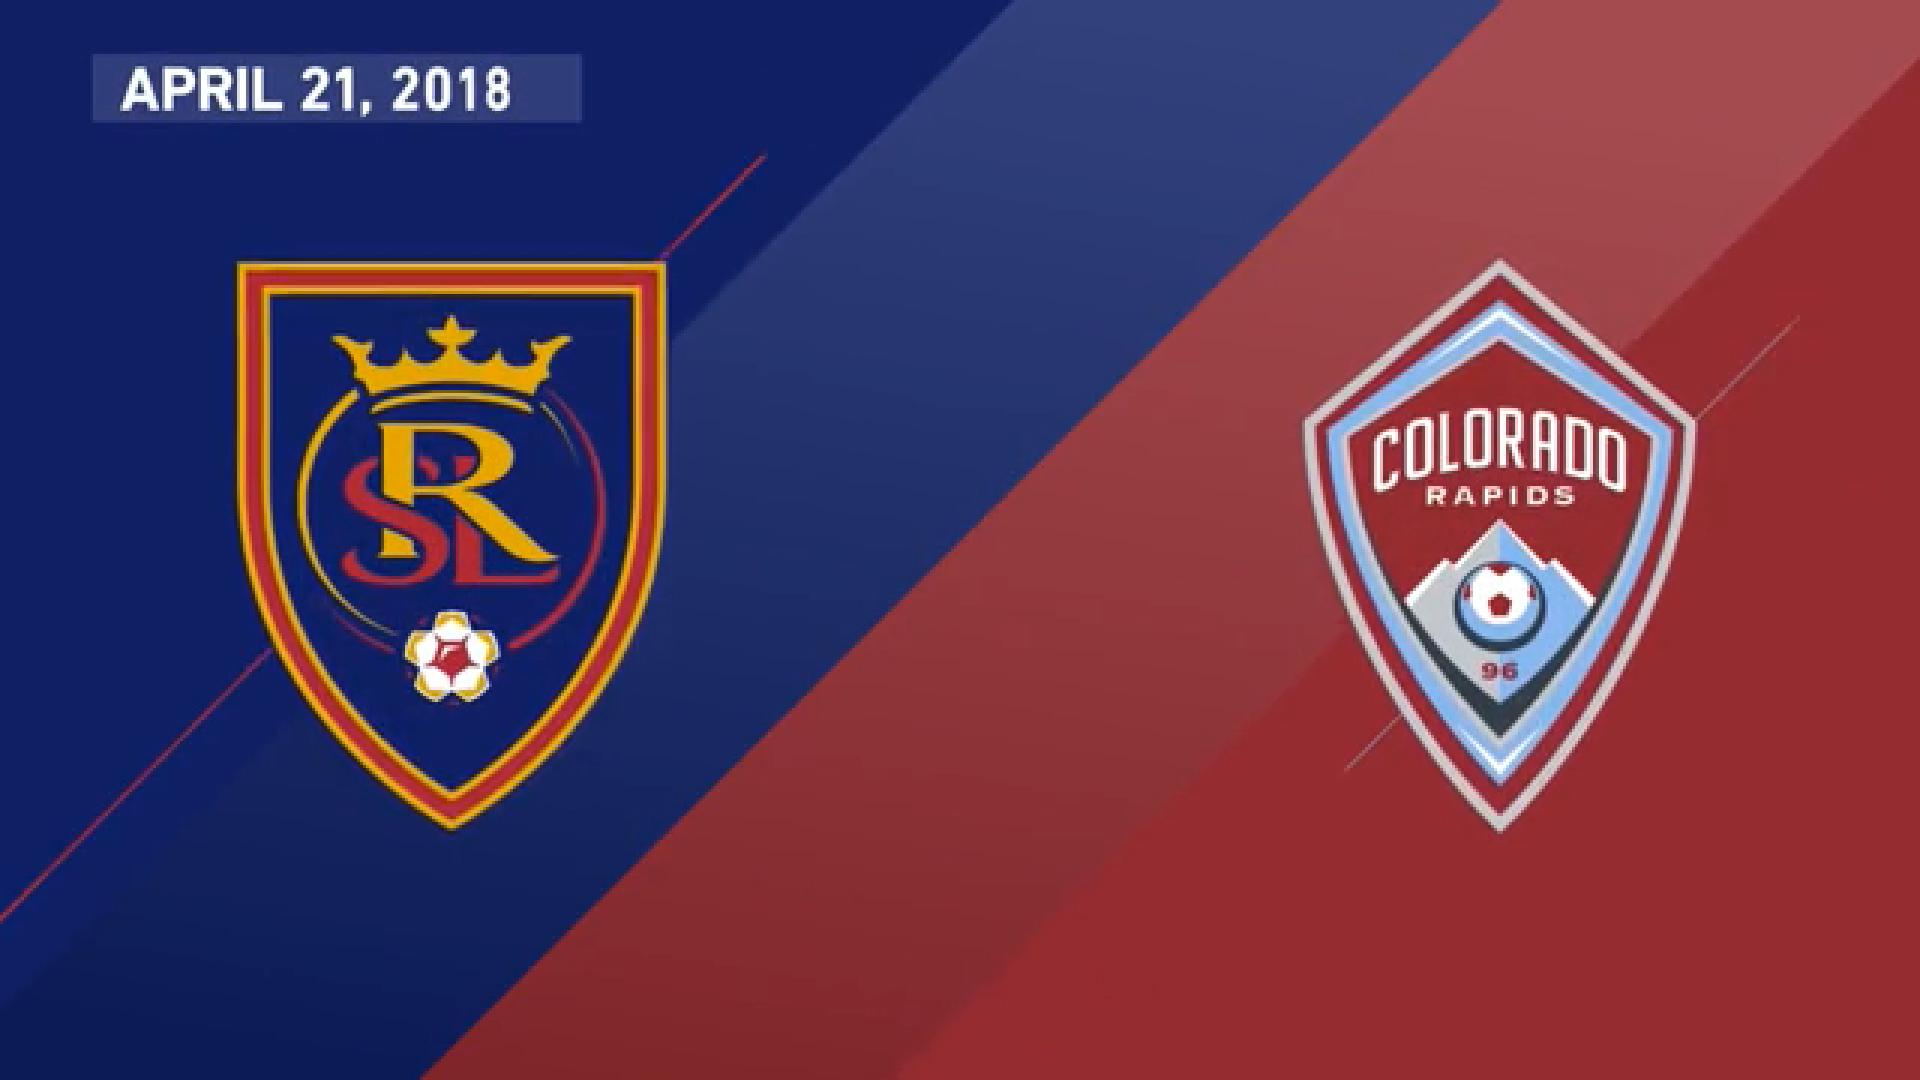 22-04-2018 - Real Salt Lake 3-0 Colorado Rapids